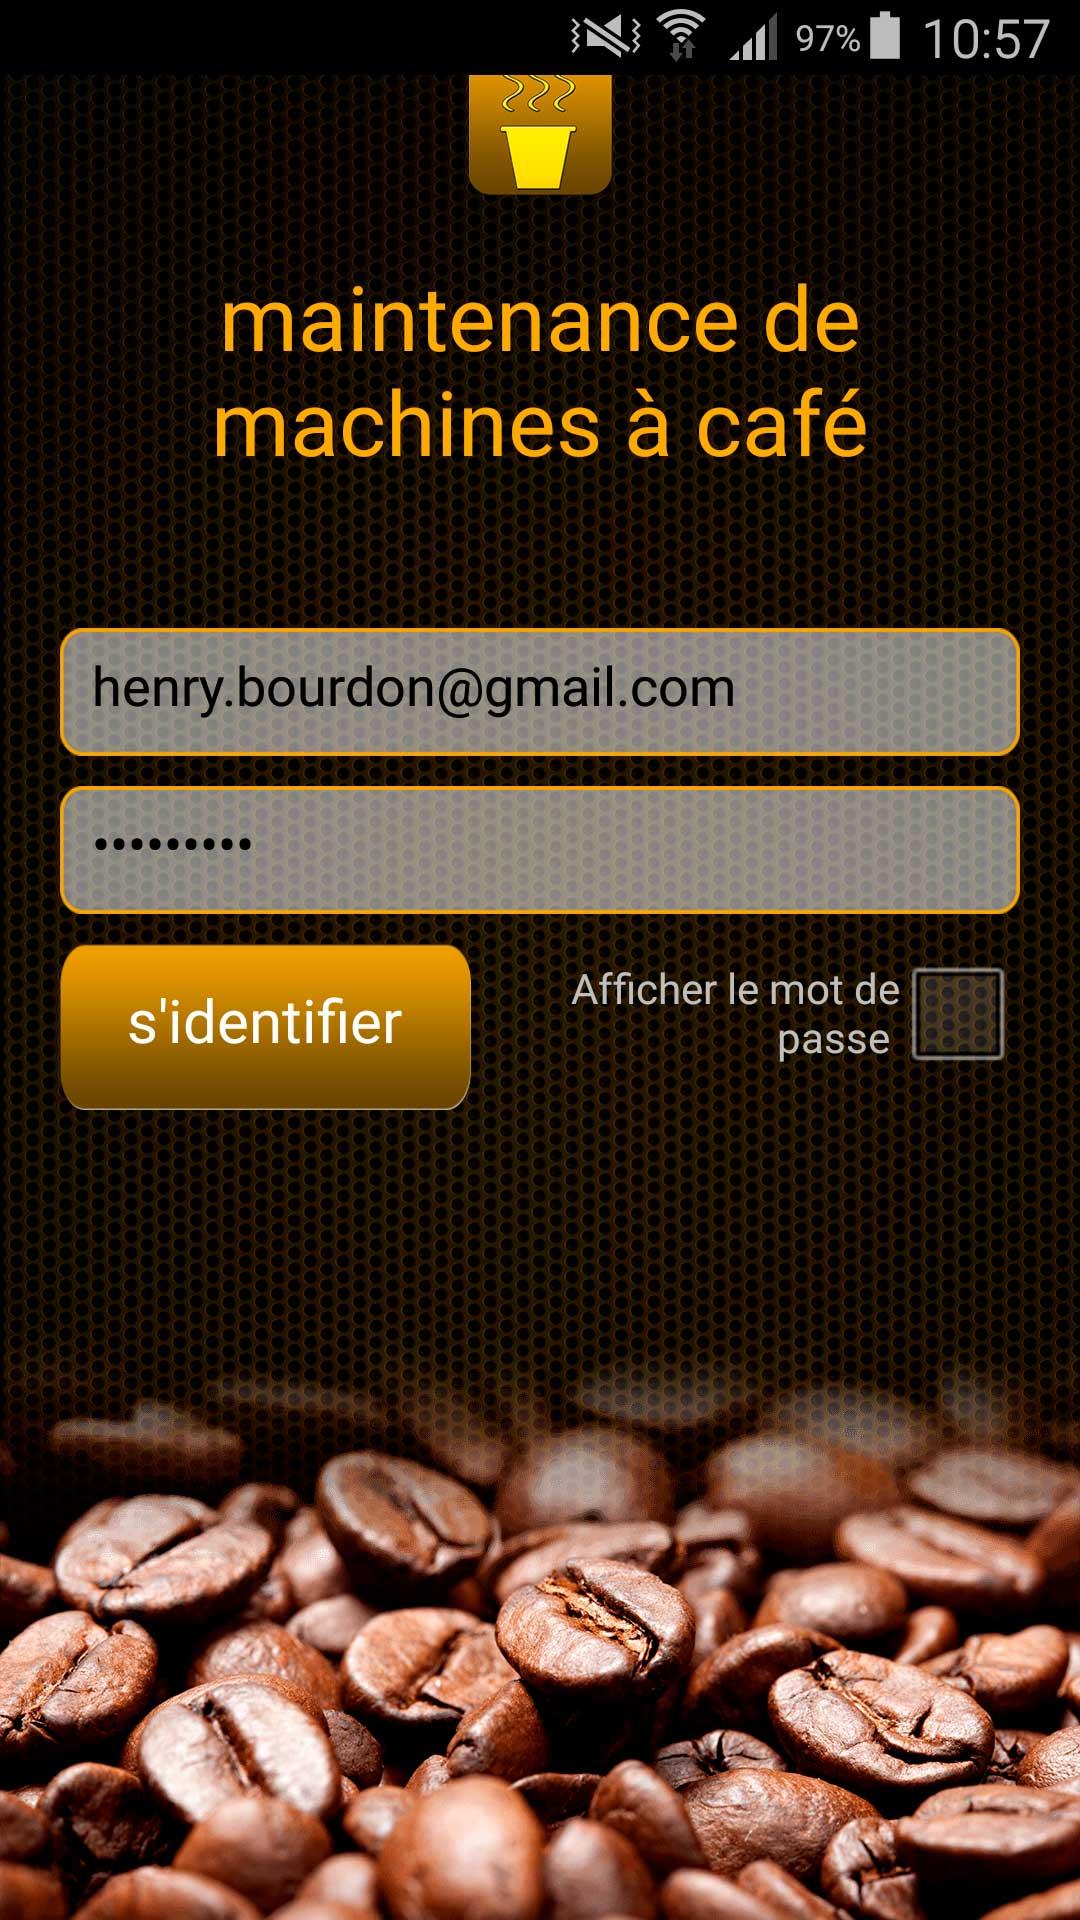 ginstr_app_coffeeMachinesMaintenance_FR_1